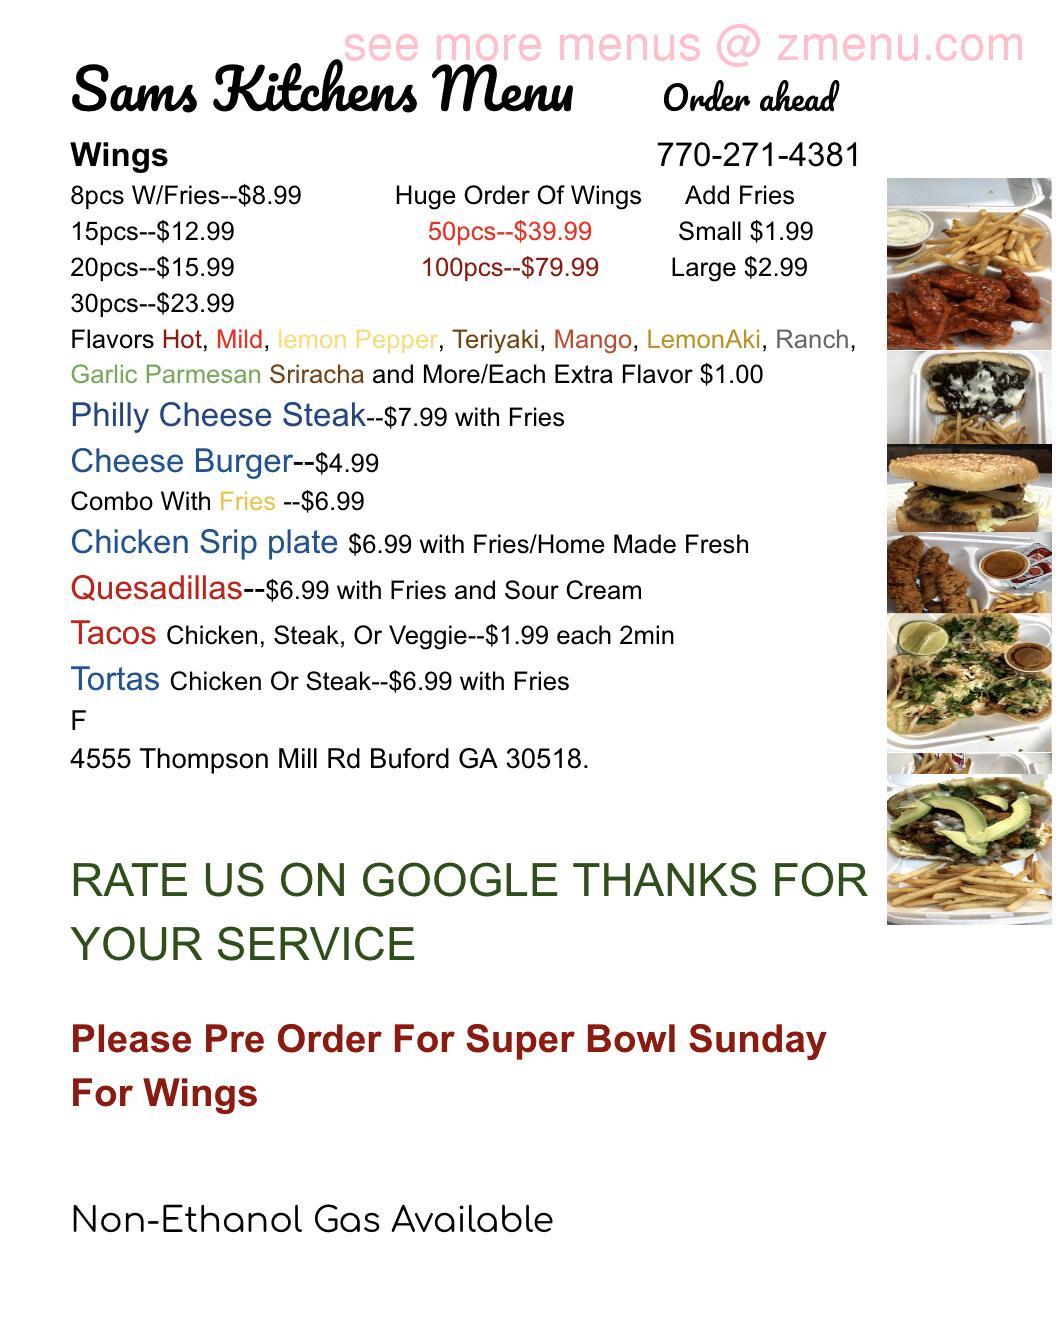 Online Menu Of Sams Kitchen Restaurant Buford Georgia 30518 Zmenu